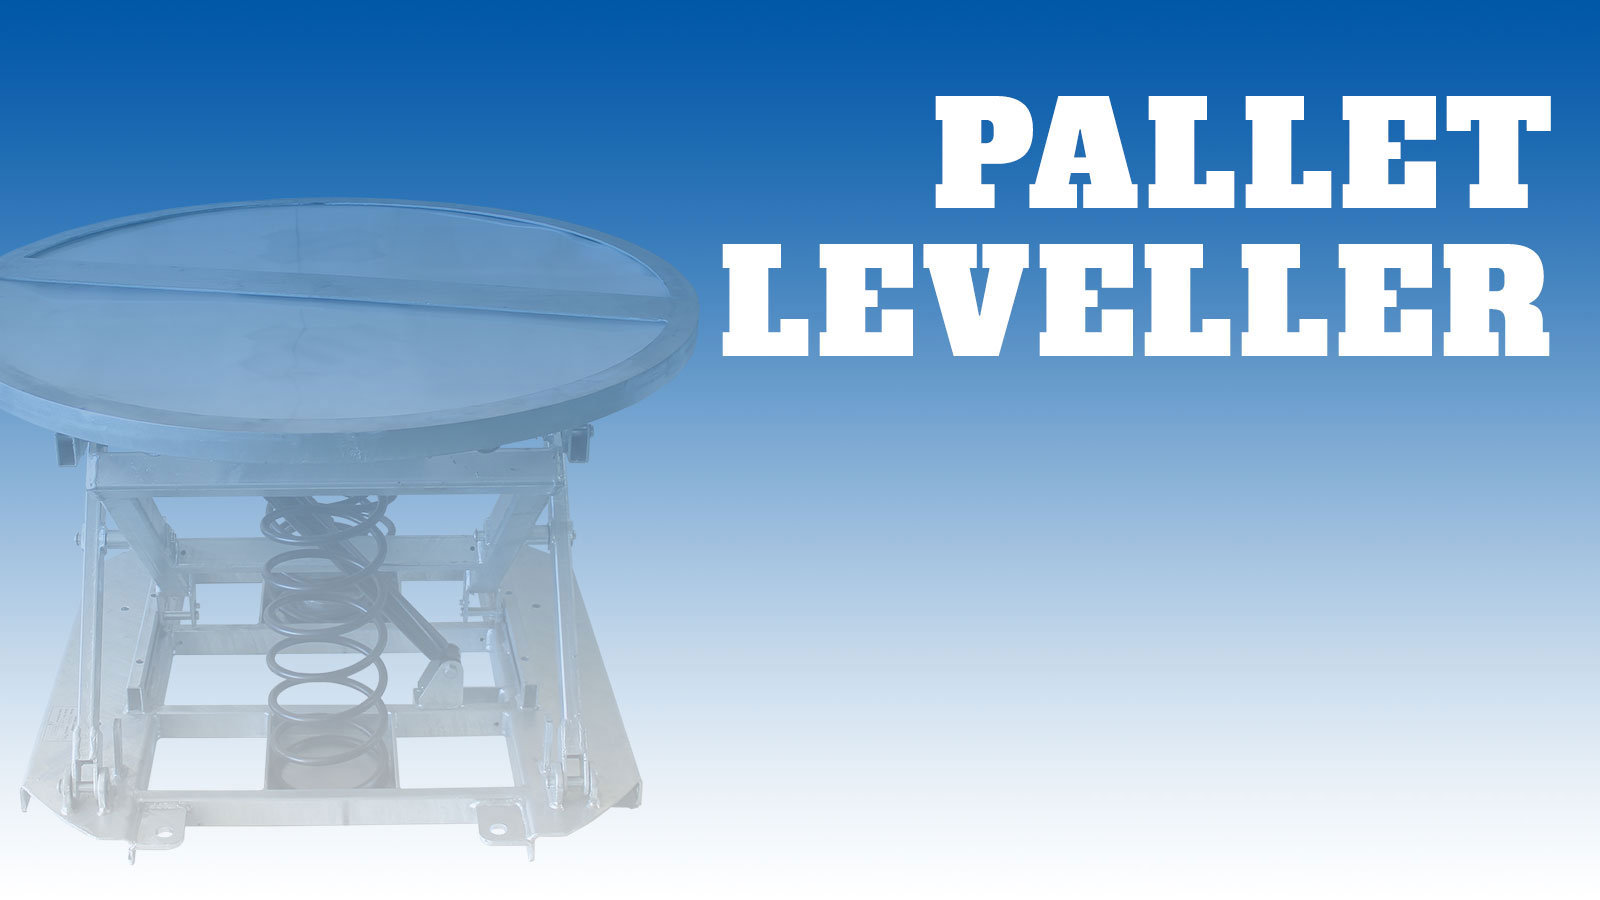 Lifting-Pallet-Leveller